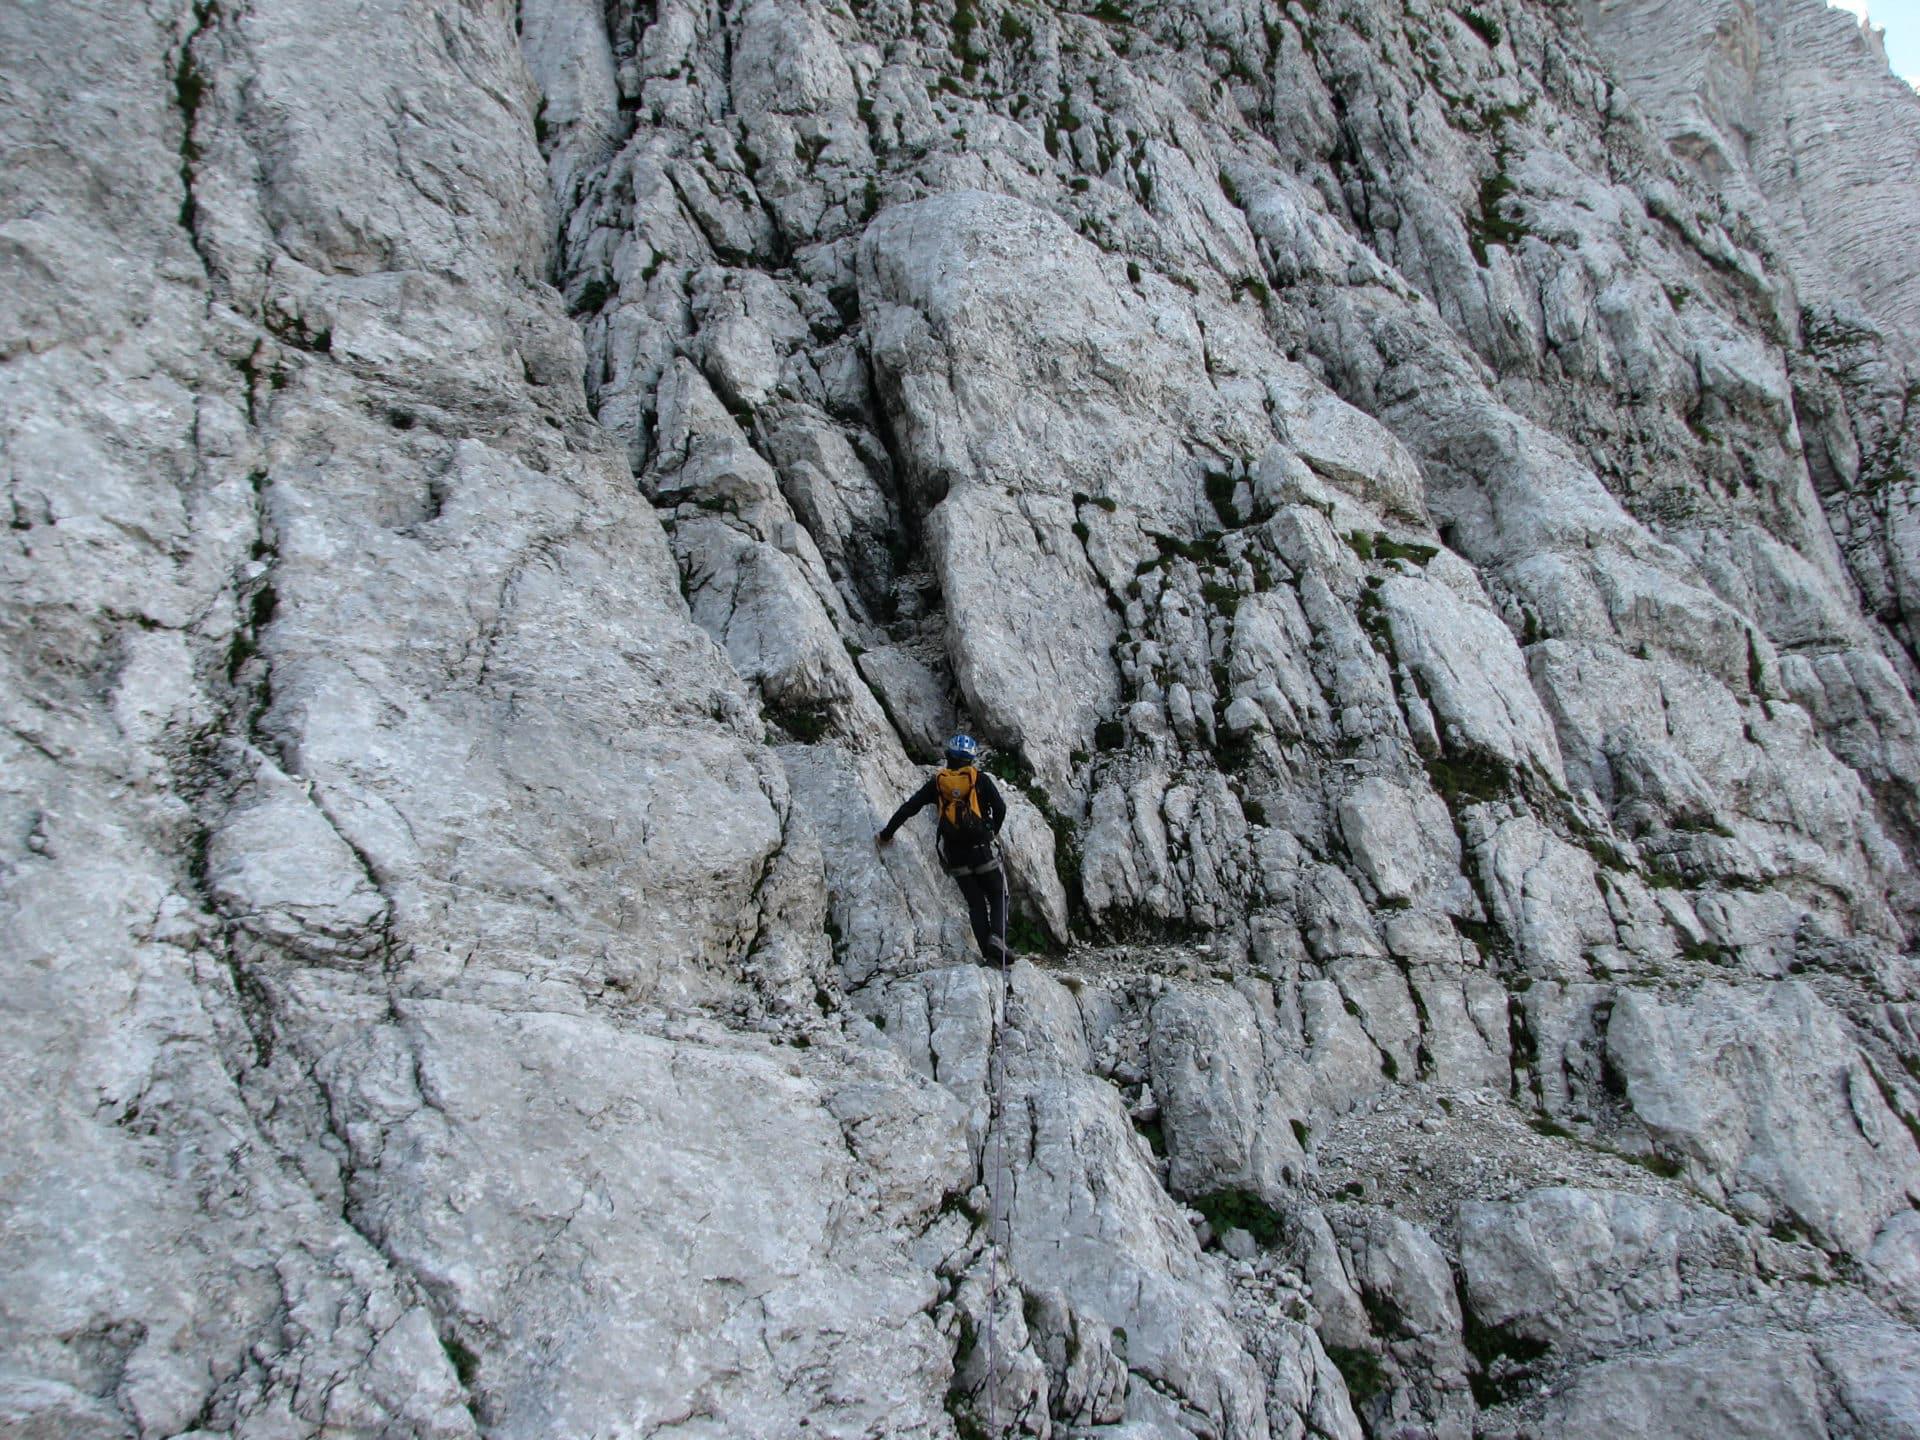 Triglav north face: climbing the Slovenian route